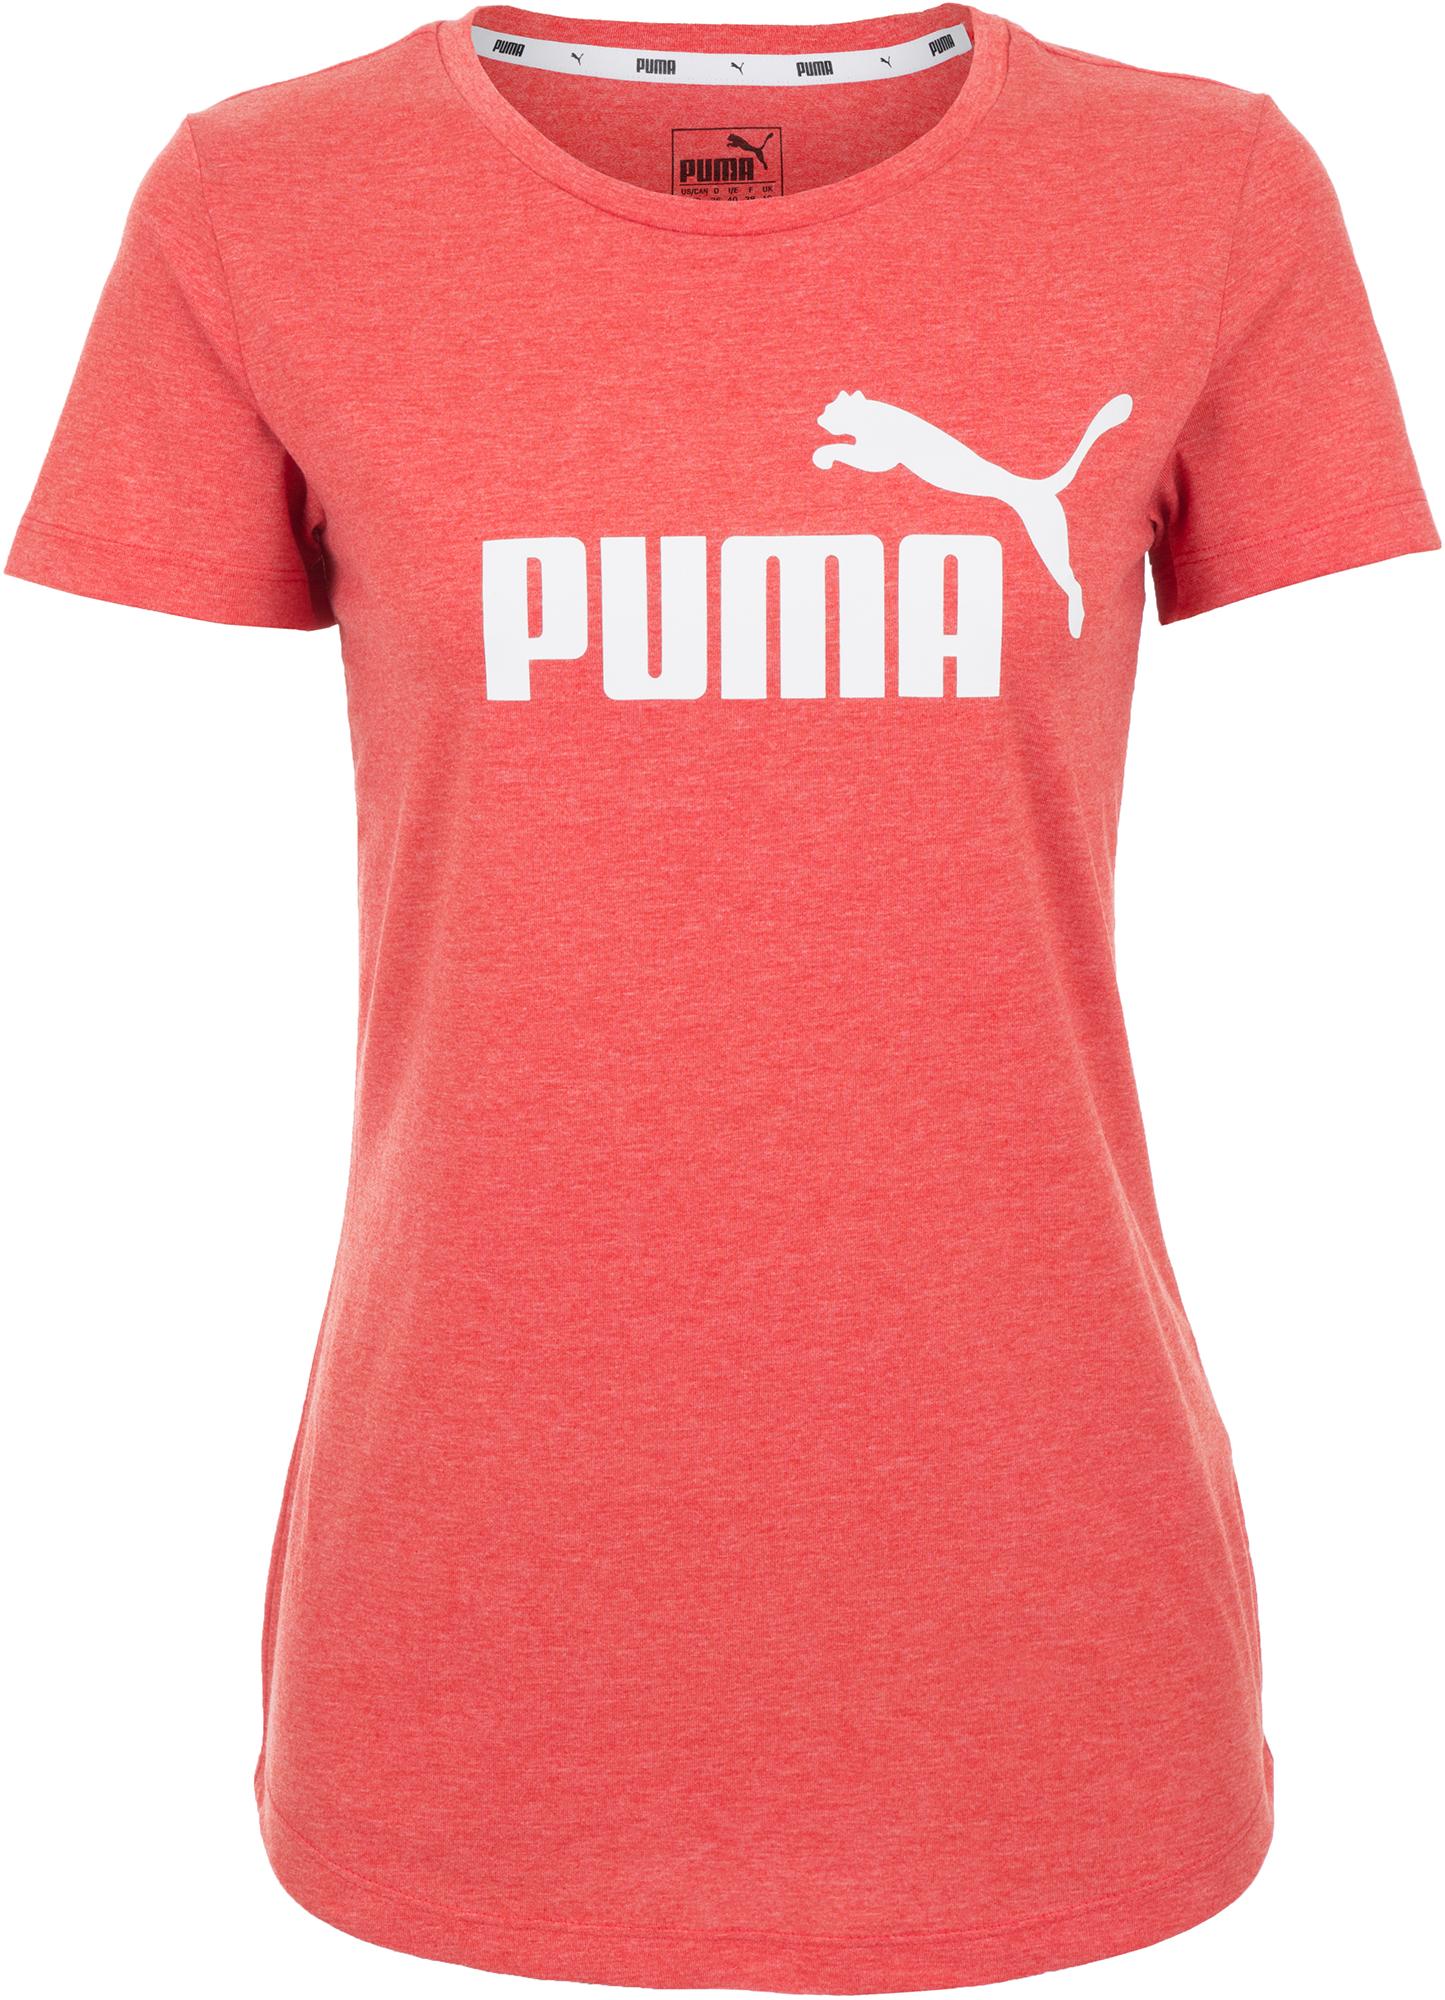 Puma Футболка женская Puma Ess+ Logo Heather, размер 48-50 футболка женская abba logo gold black размер s